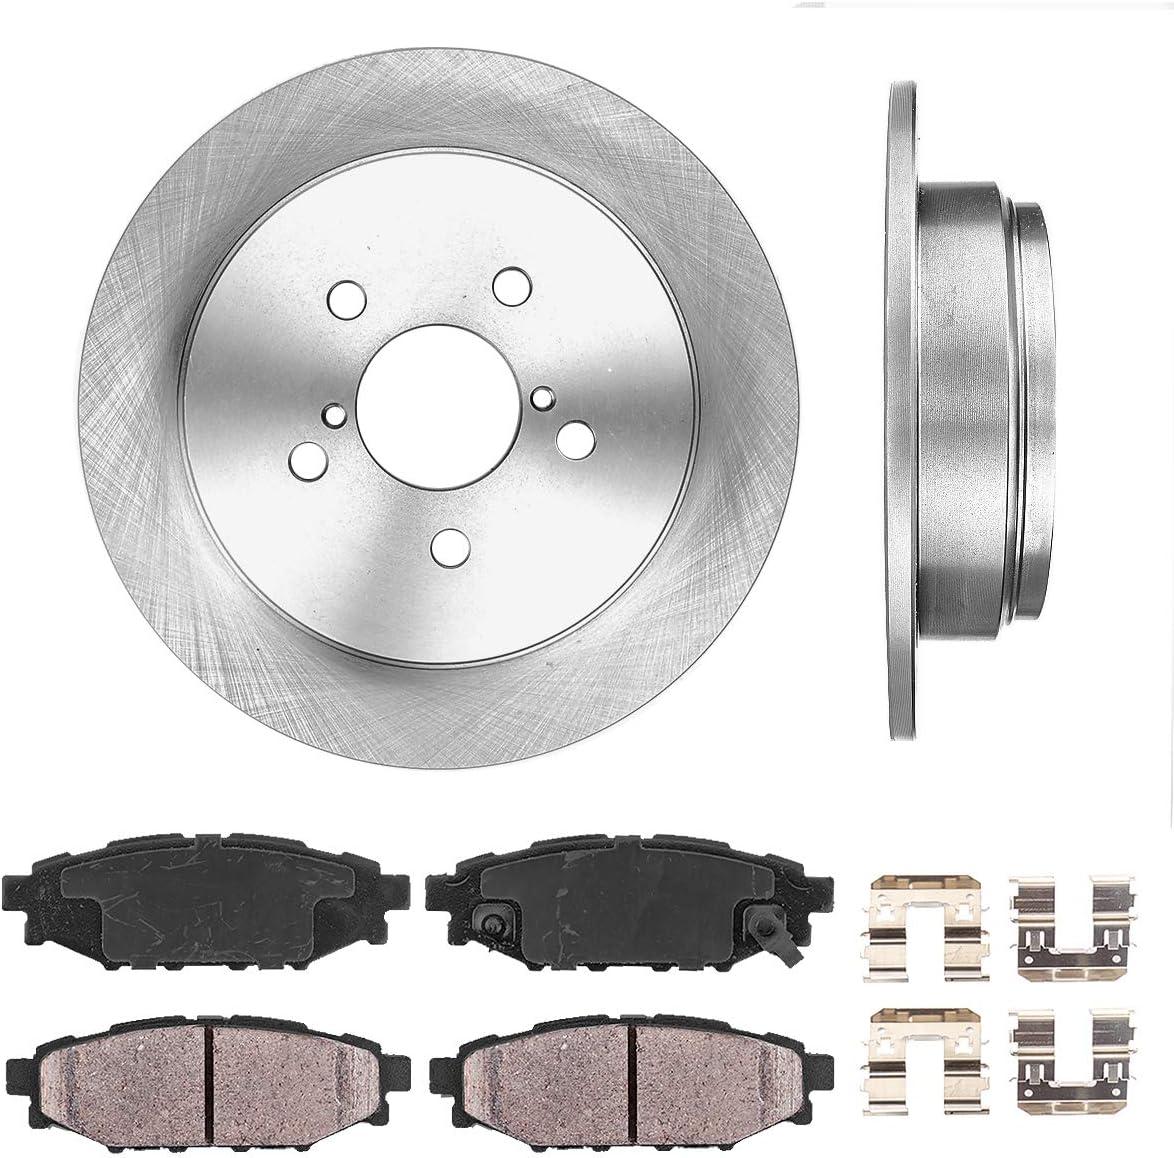 CRK14754 REAR 273.8 mm Premium OE 5 Lug 2 Brake + Free Shipping Cheap Bargain Gift Rotors Gorgeous Disc